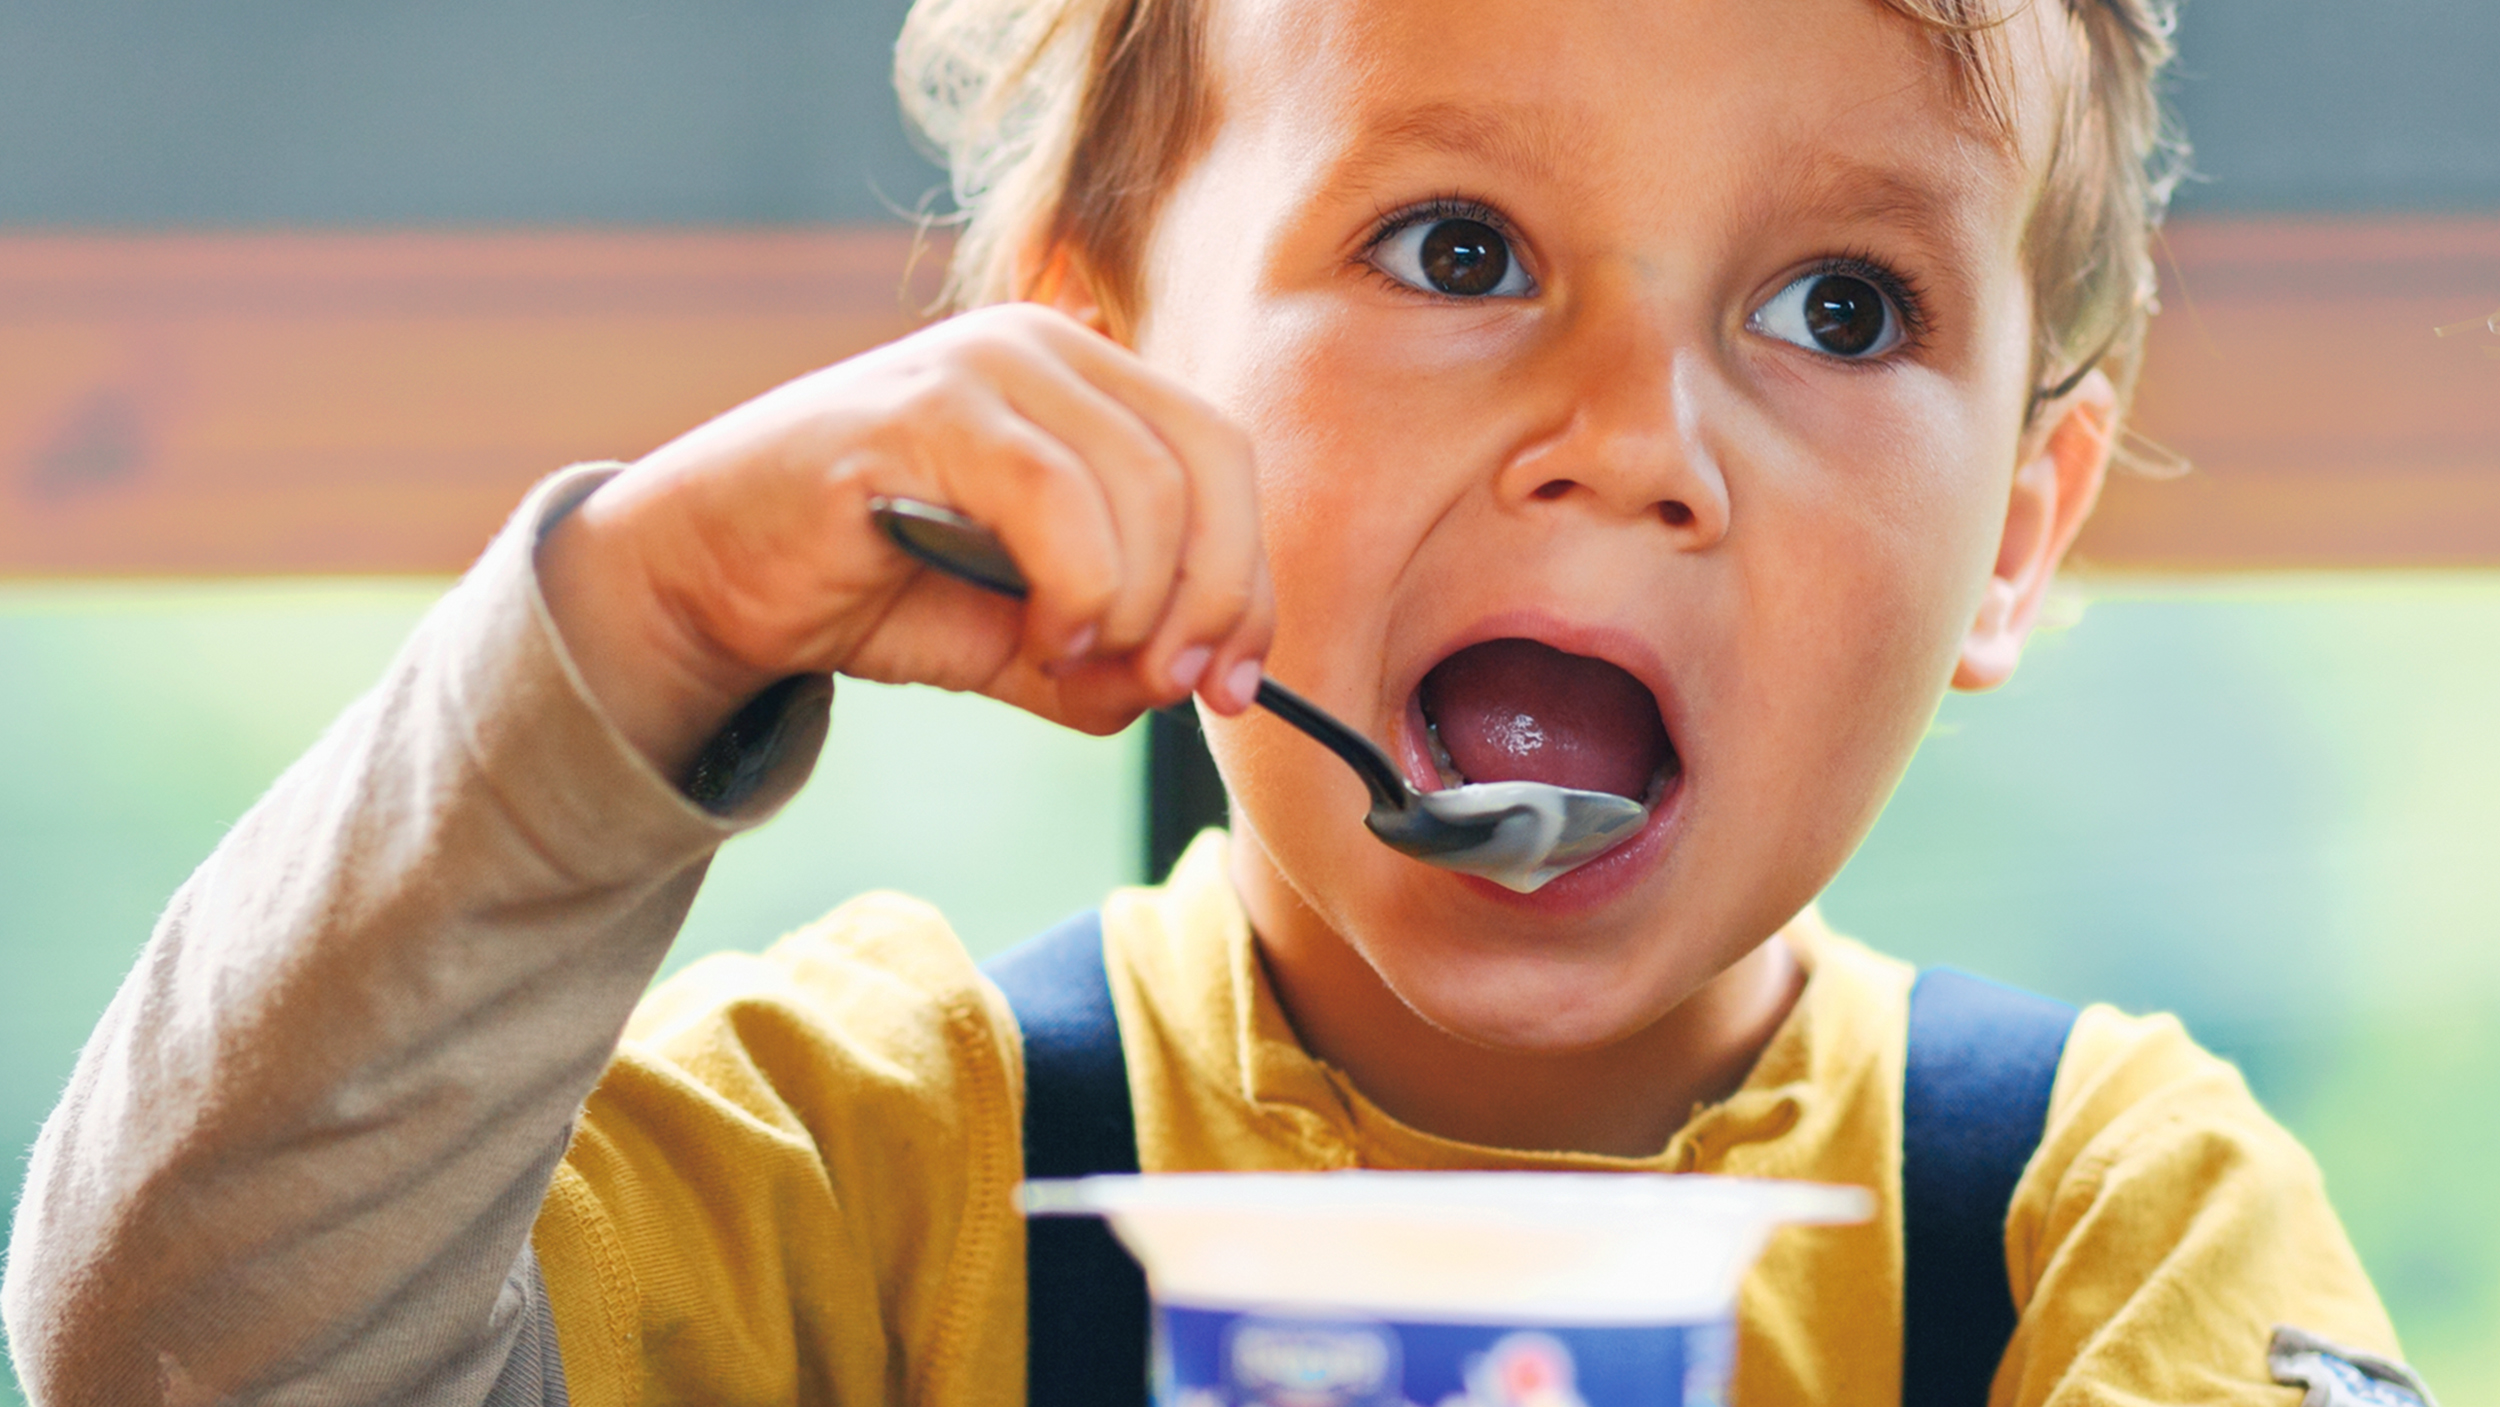 Do You Eat Or Drink Yogurt